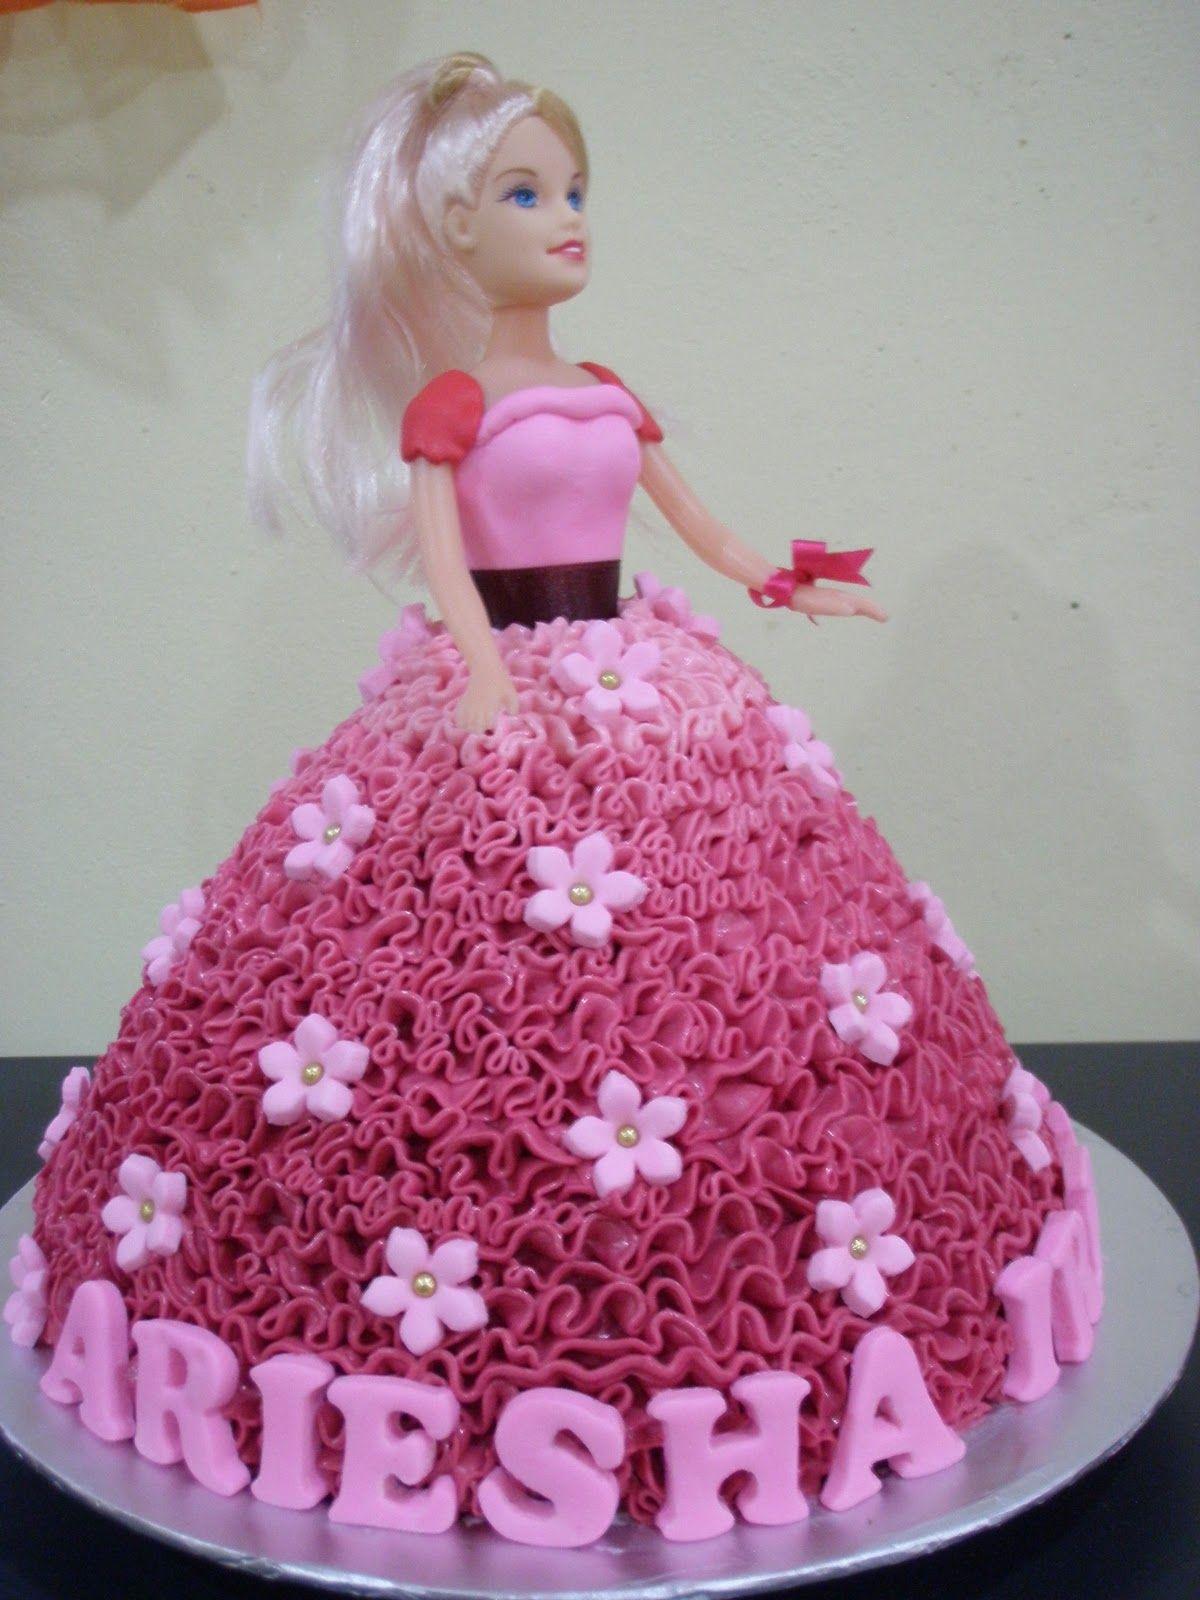 Barbie Princess Cake Design : barbie doll cake My Home Bakery :: Barbie Doll Cakes ...